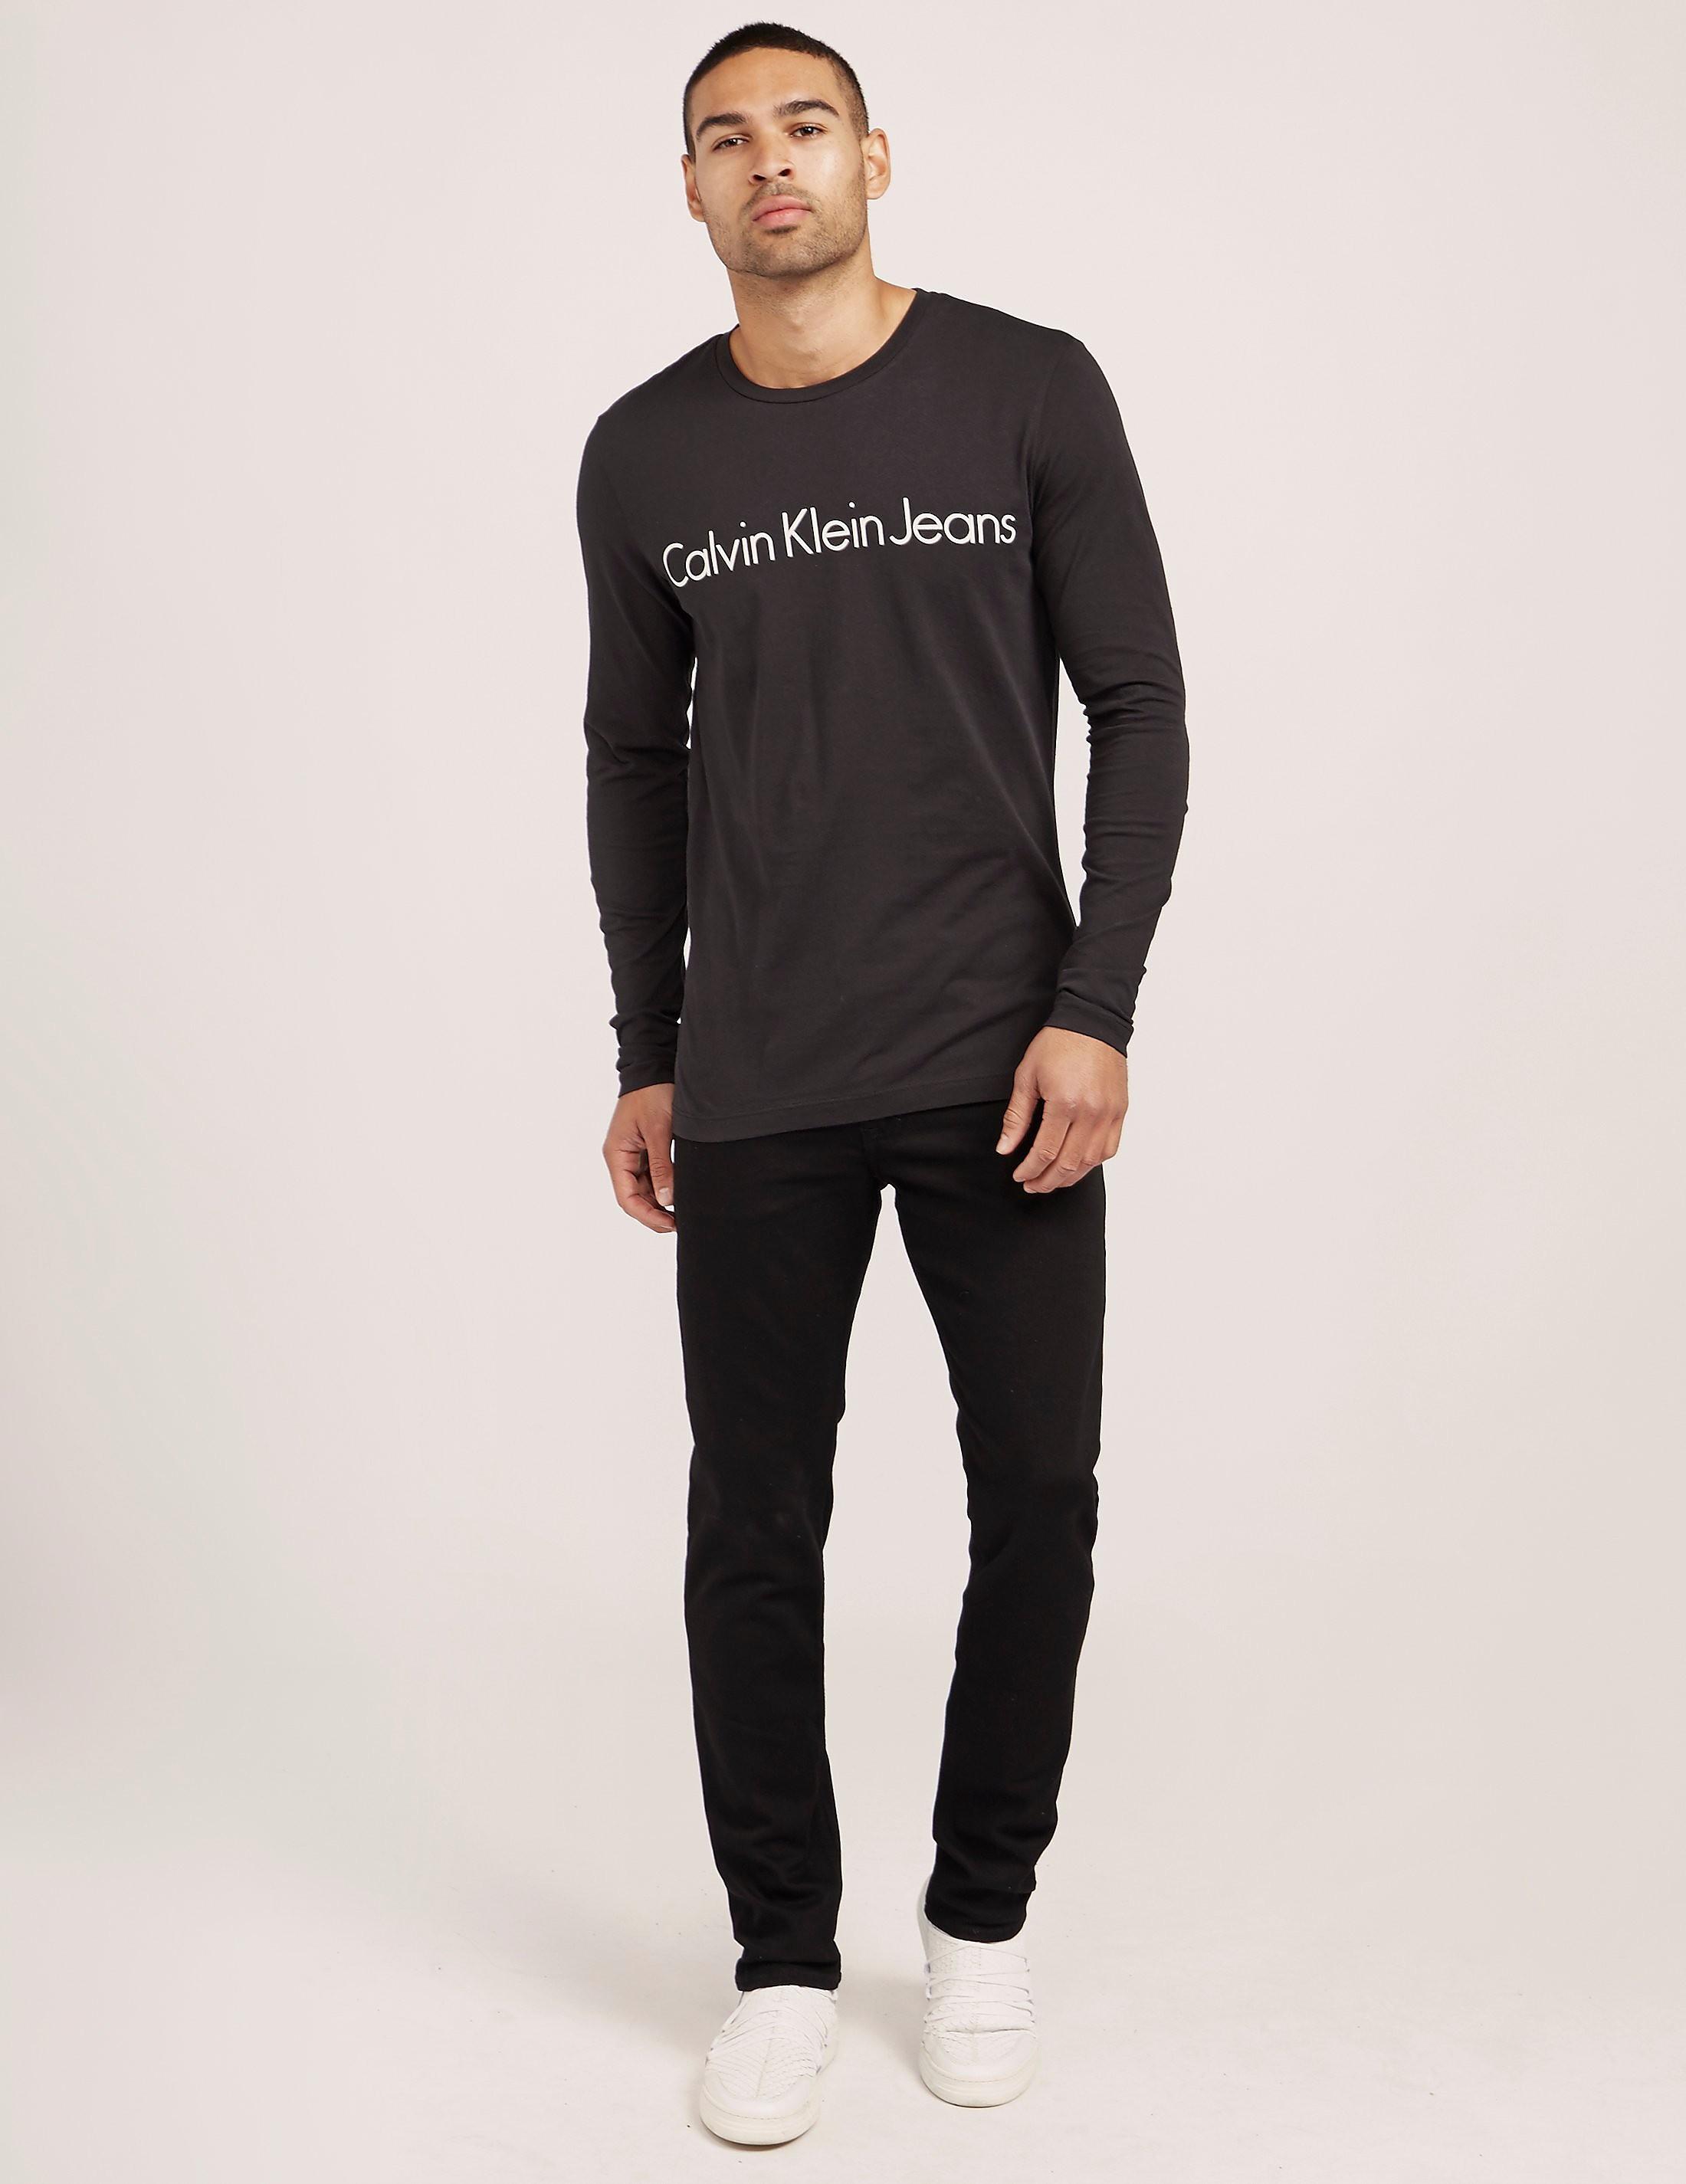 Calvin Klein Treasure Long Sleeve T-Shirt